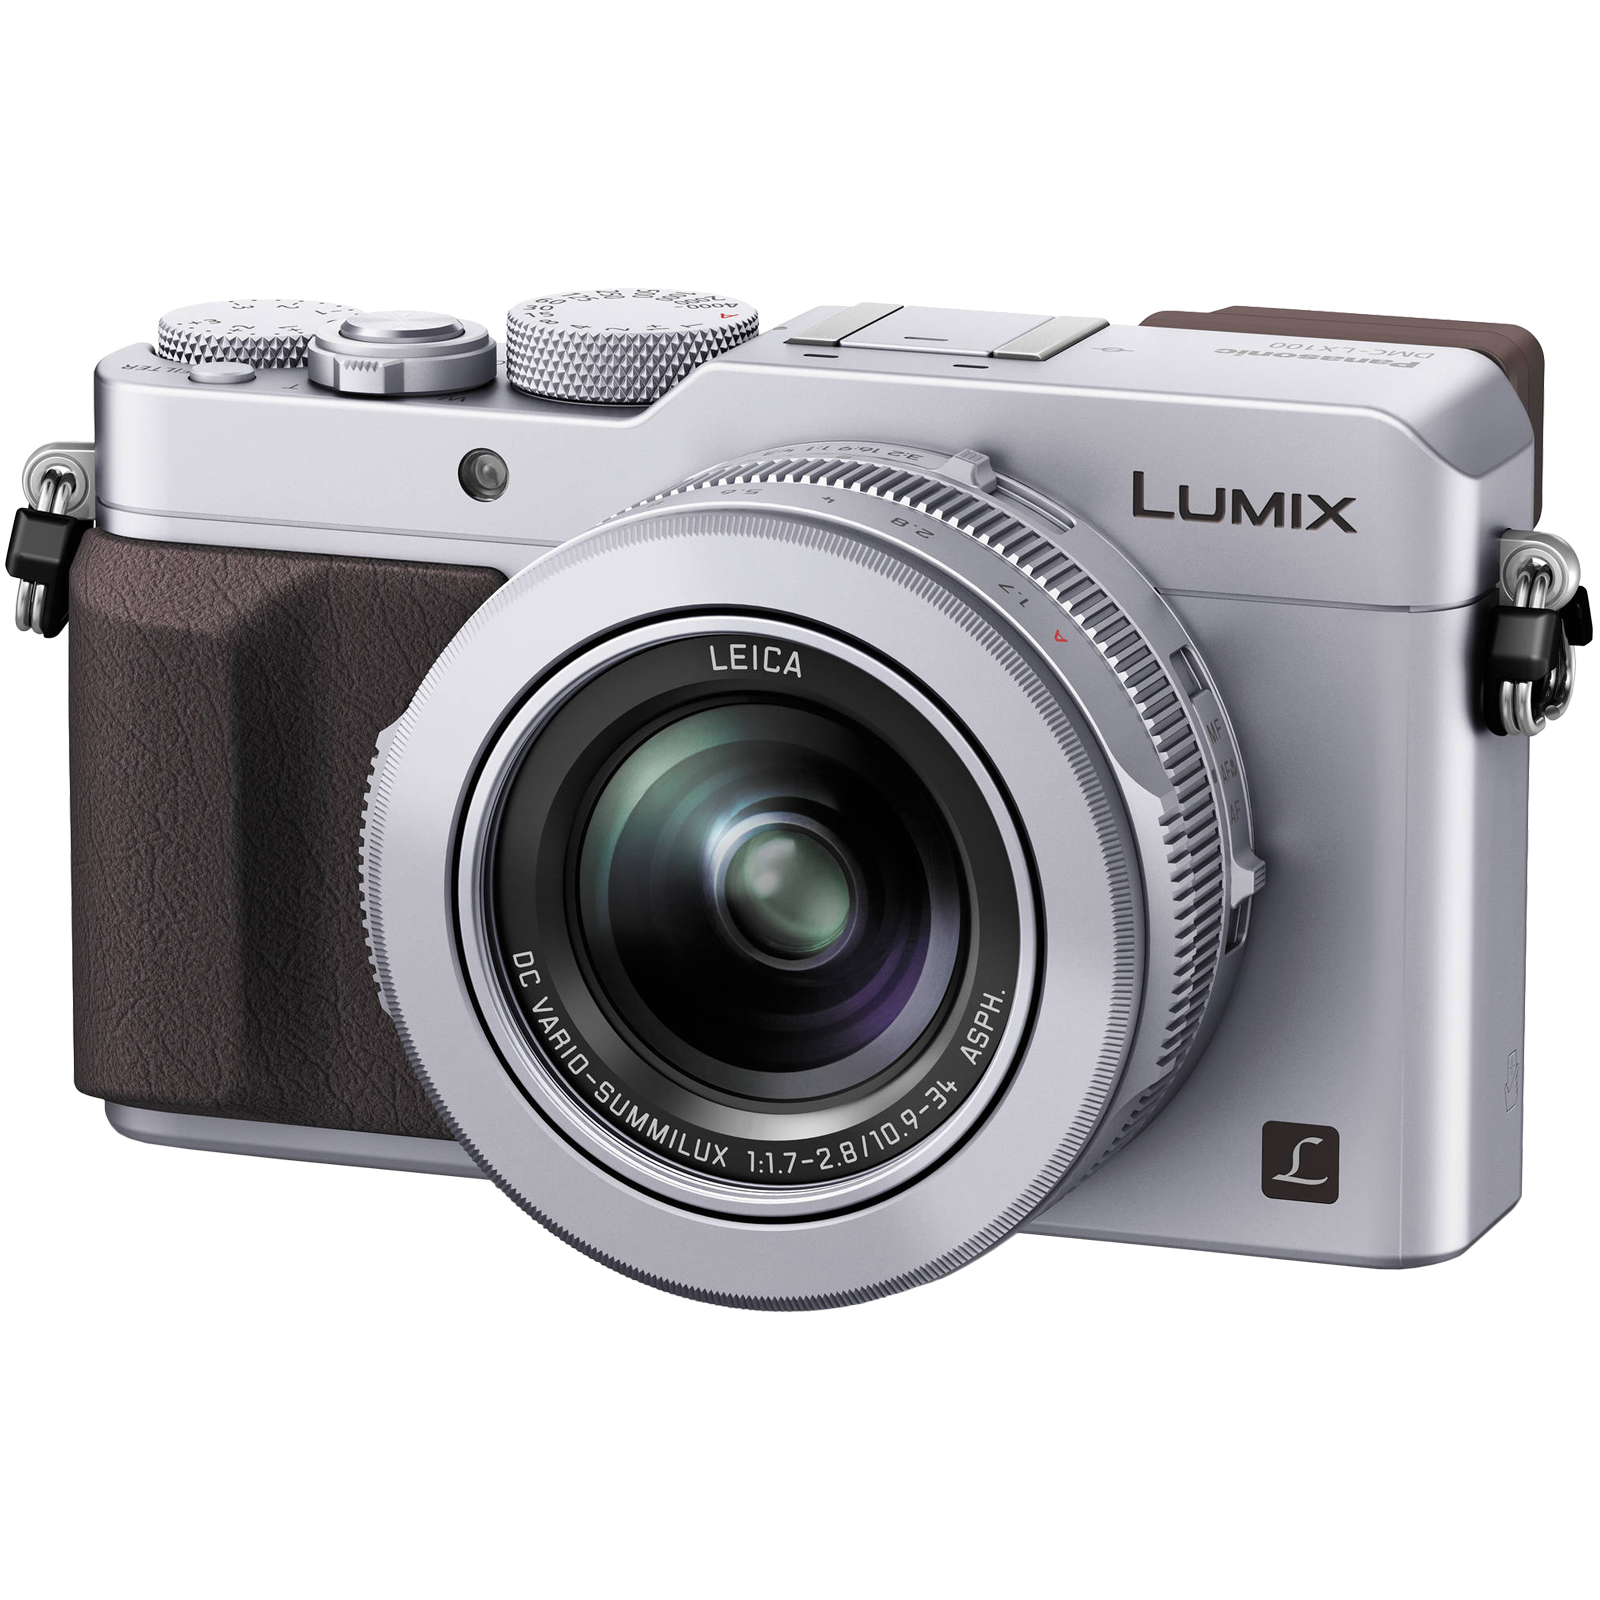 Panasonic Lumix DMC-LX100 4K Wi-Fi Digital Camera (Silver) Micro Four Thirds / Full HD 60P Video / Leica 24-75mm f/1.7-2.8 Lens